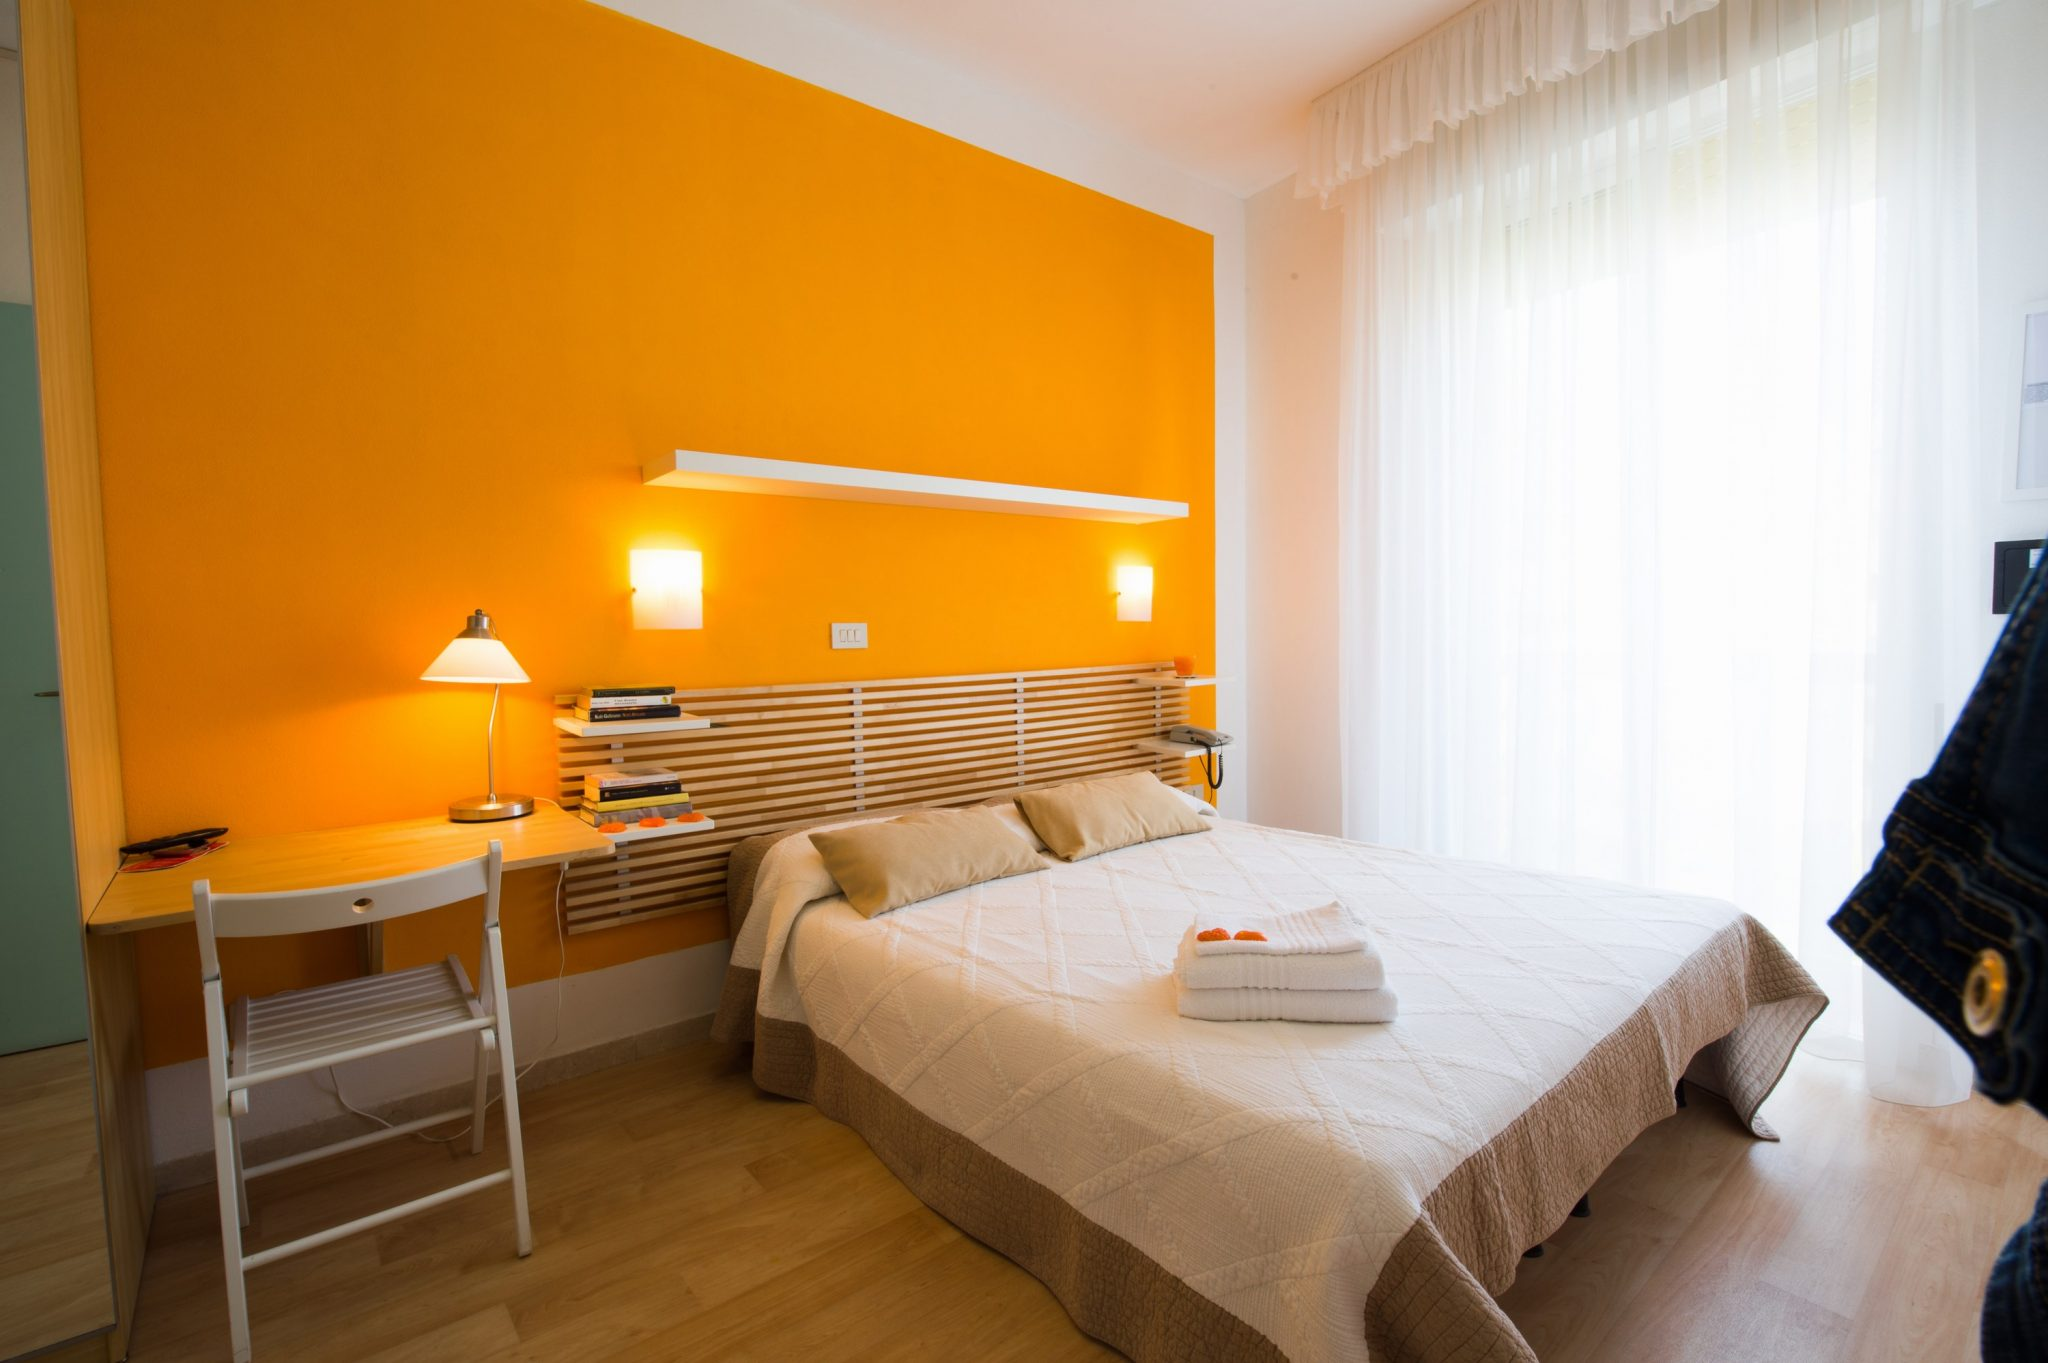 http://www.hotelvenezuela.it/wp-content/uploads/2016/11/mini-HVE_0005.jpg